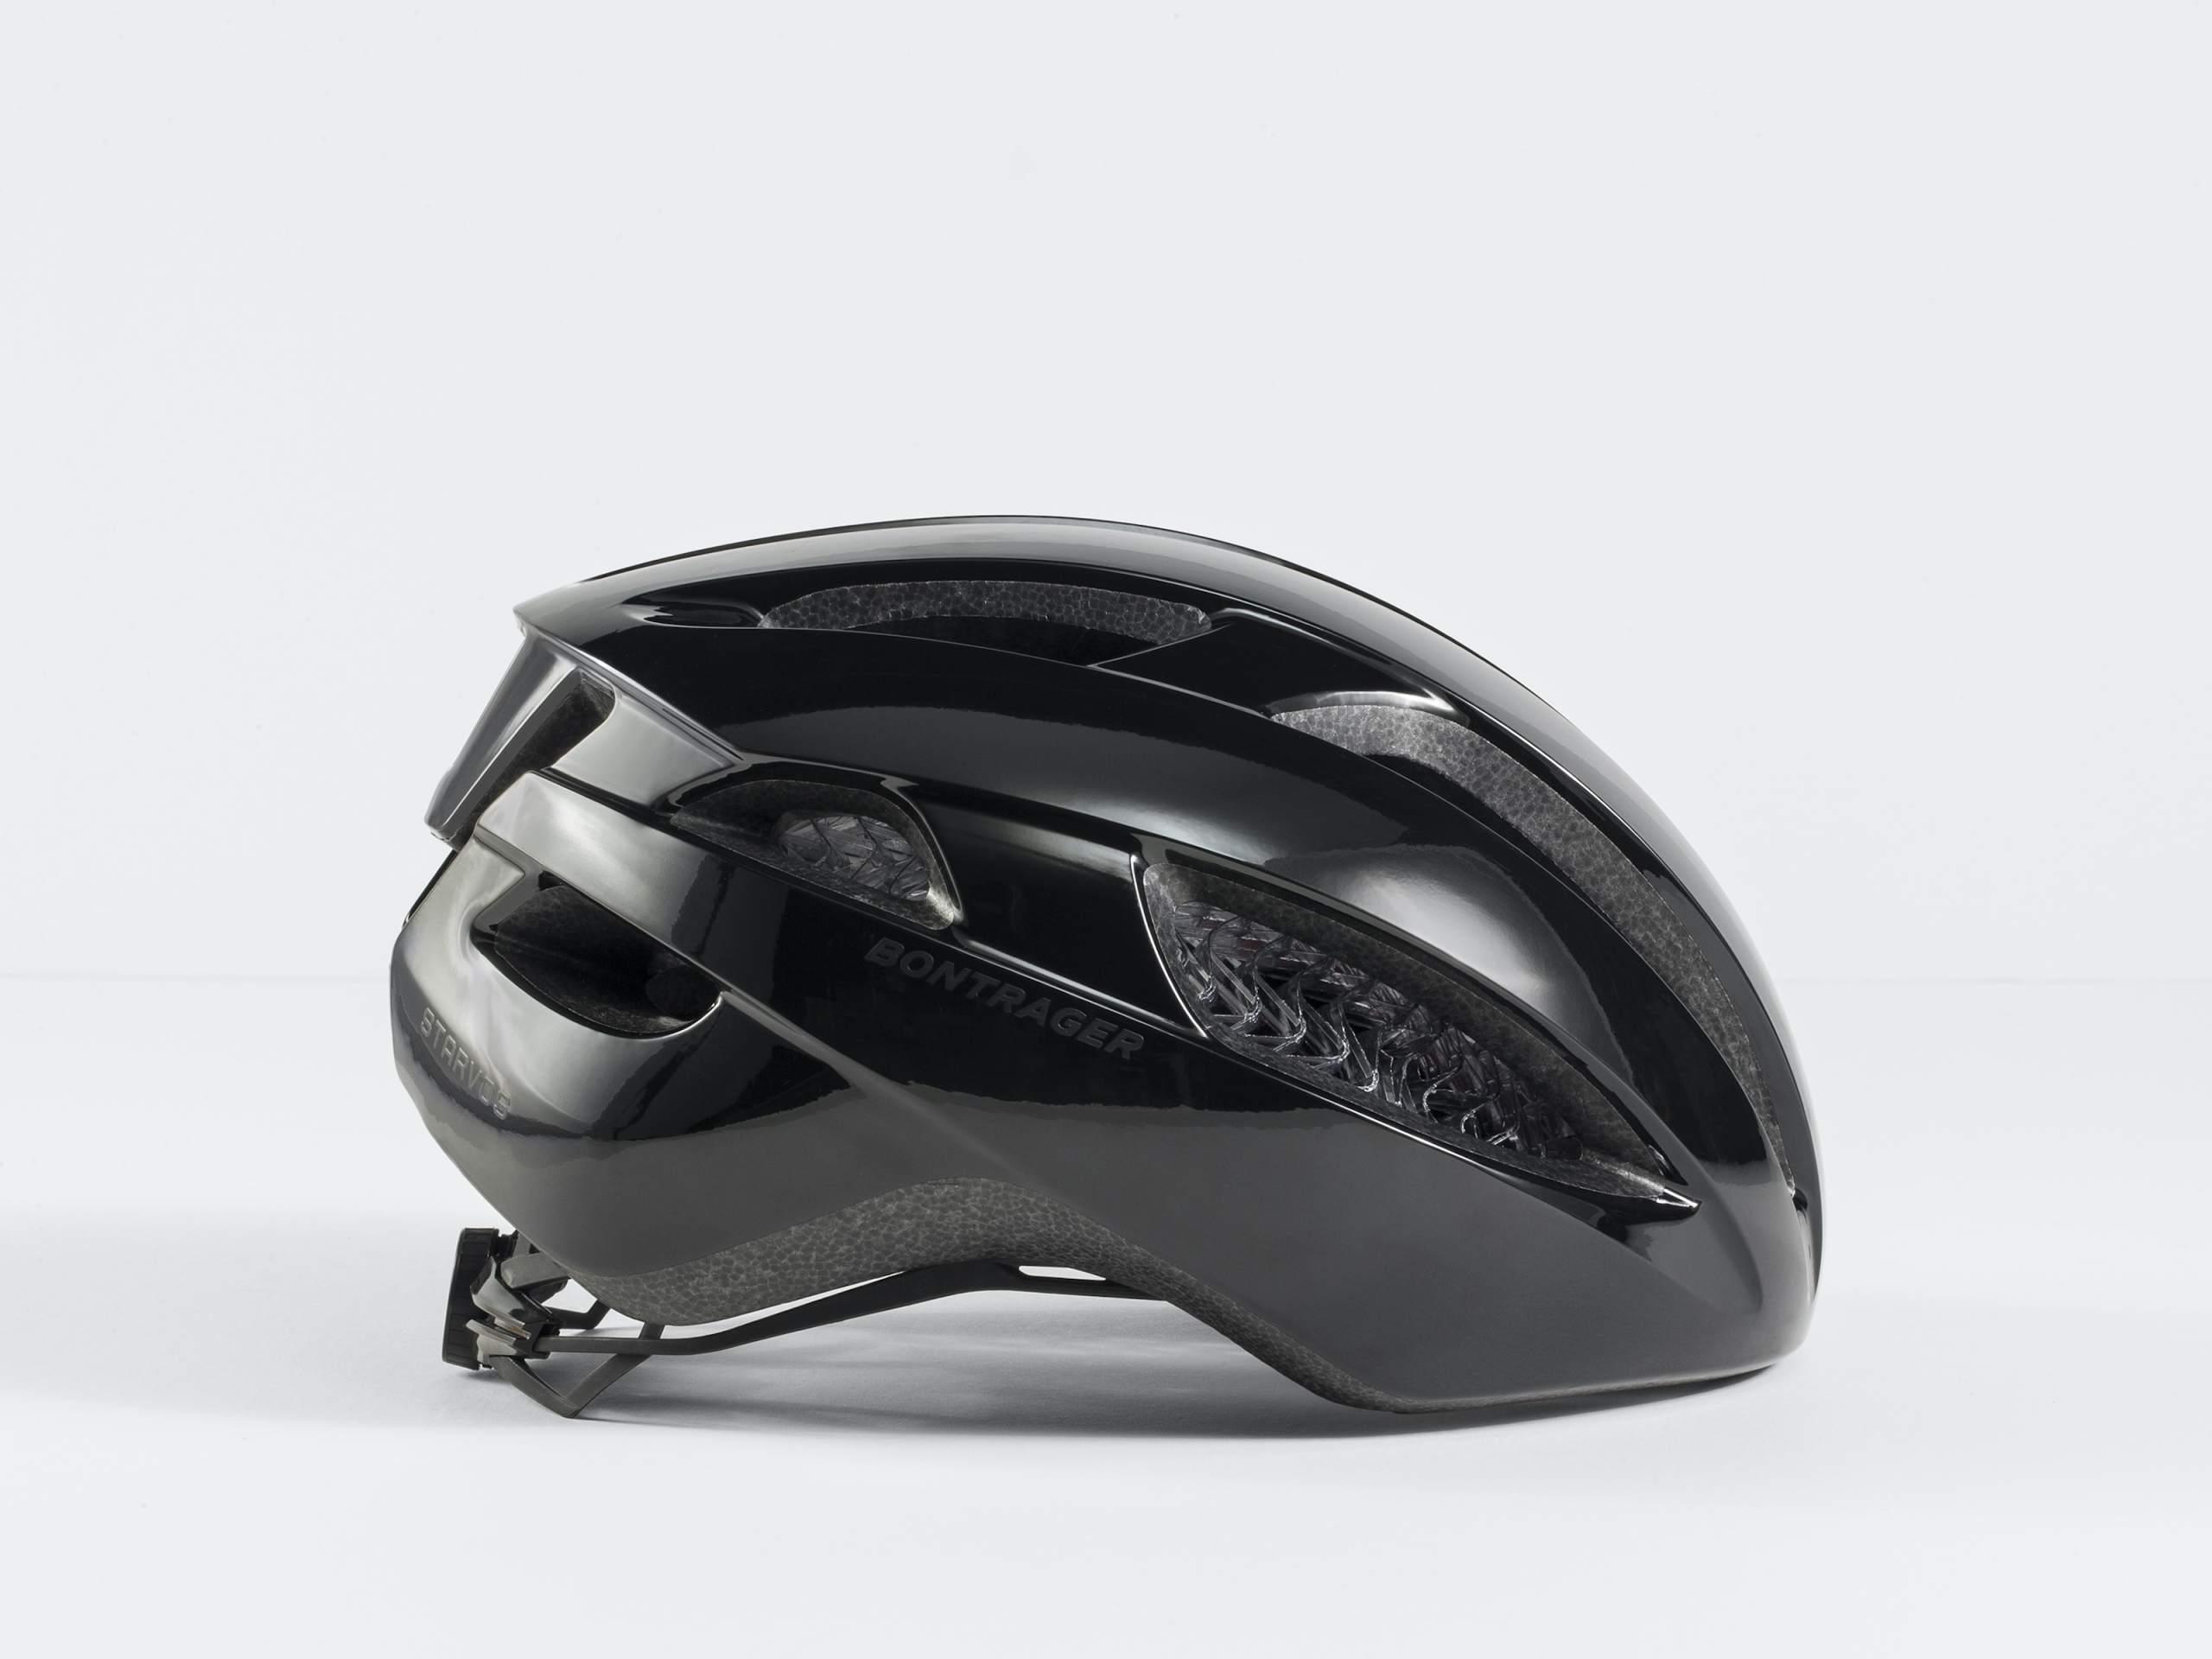 Bontrager Starvos WaveCell Helmet